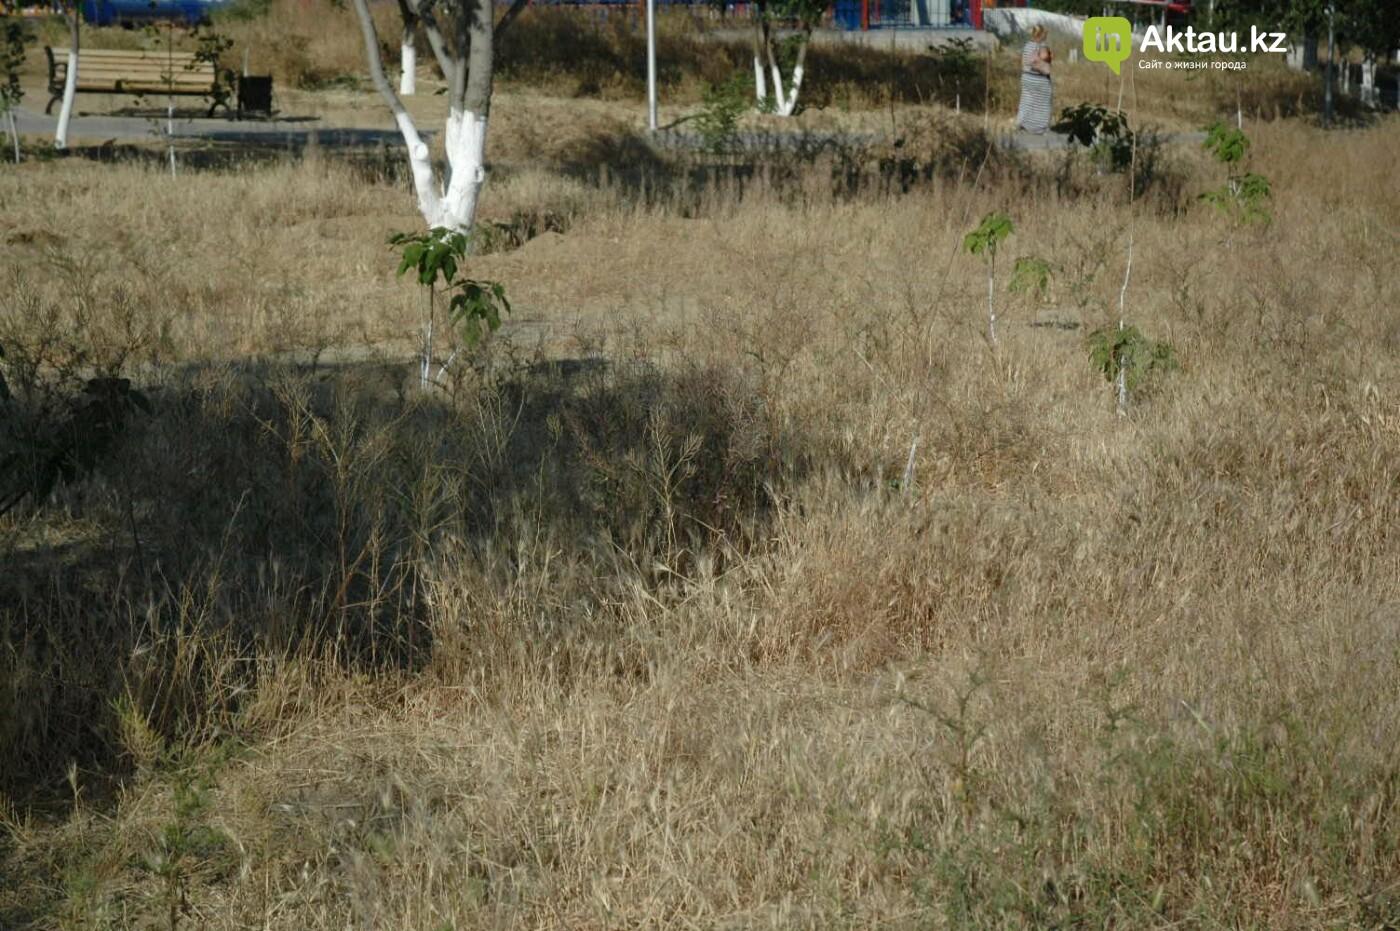 Погибшие от засухи и обезвоживания в Актау исчисляются десятками (ФОТО), фото-42